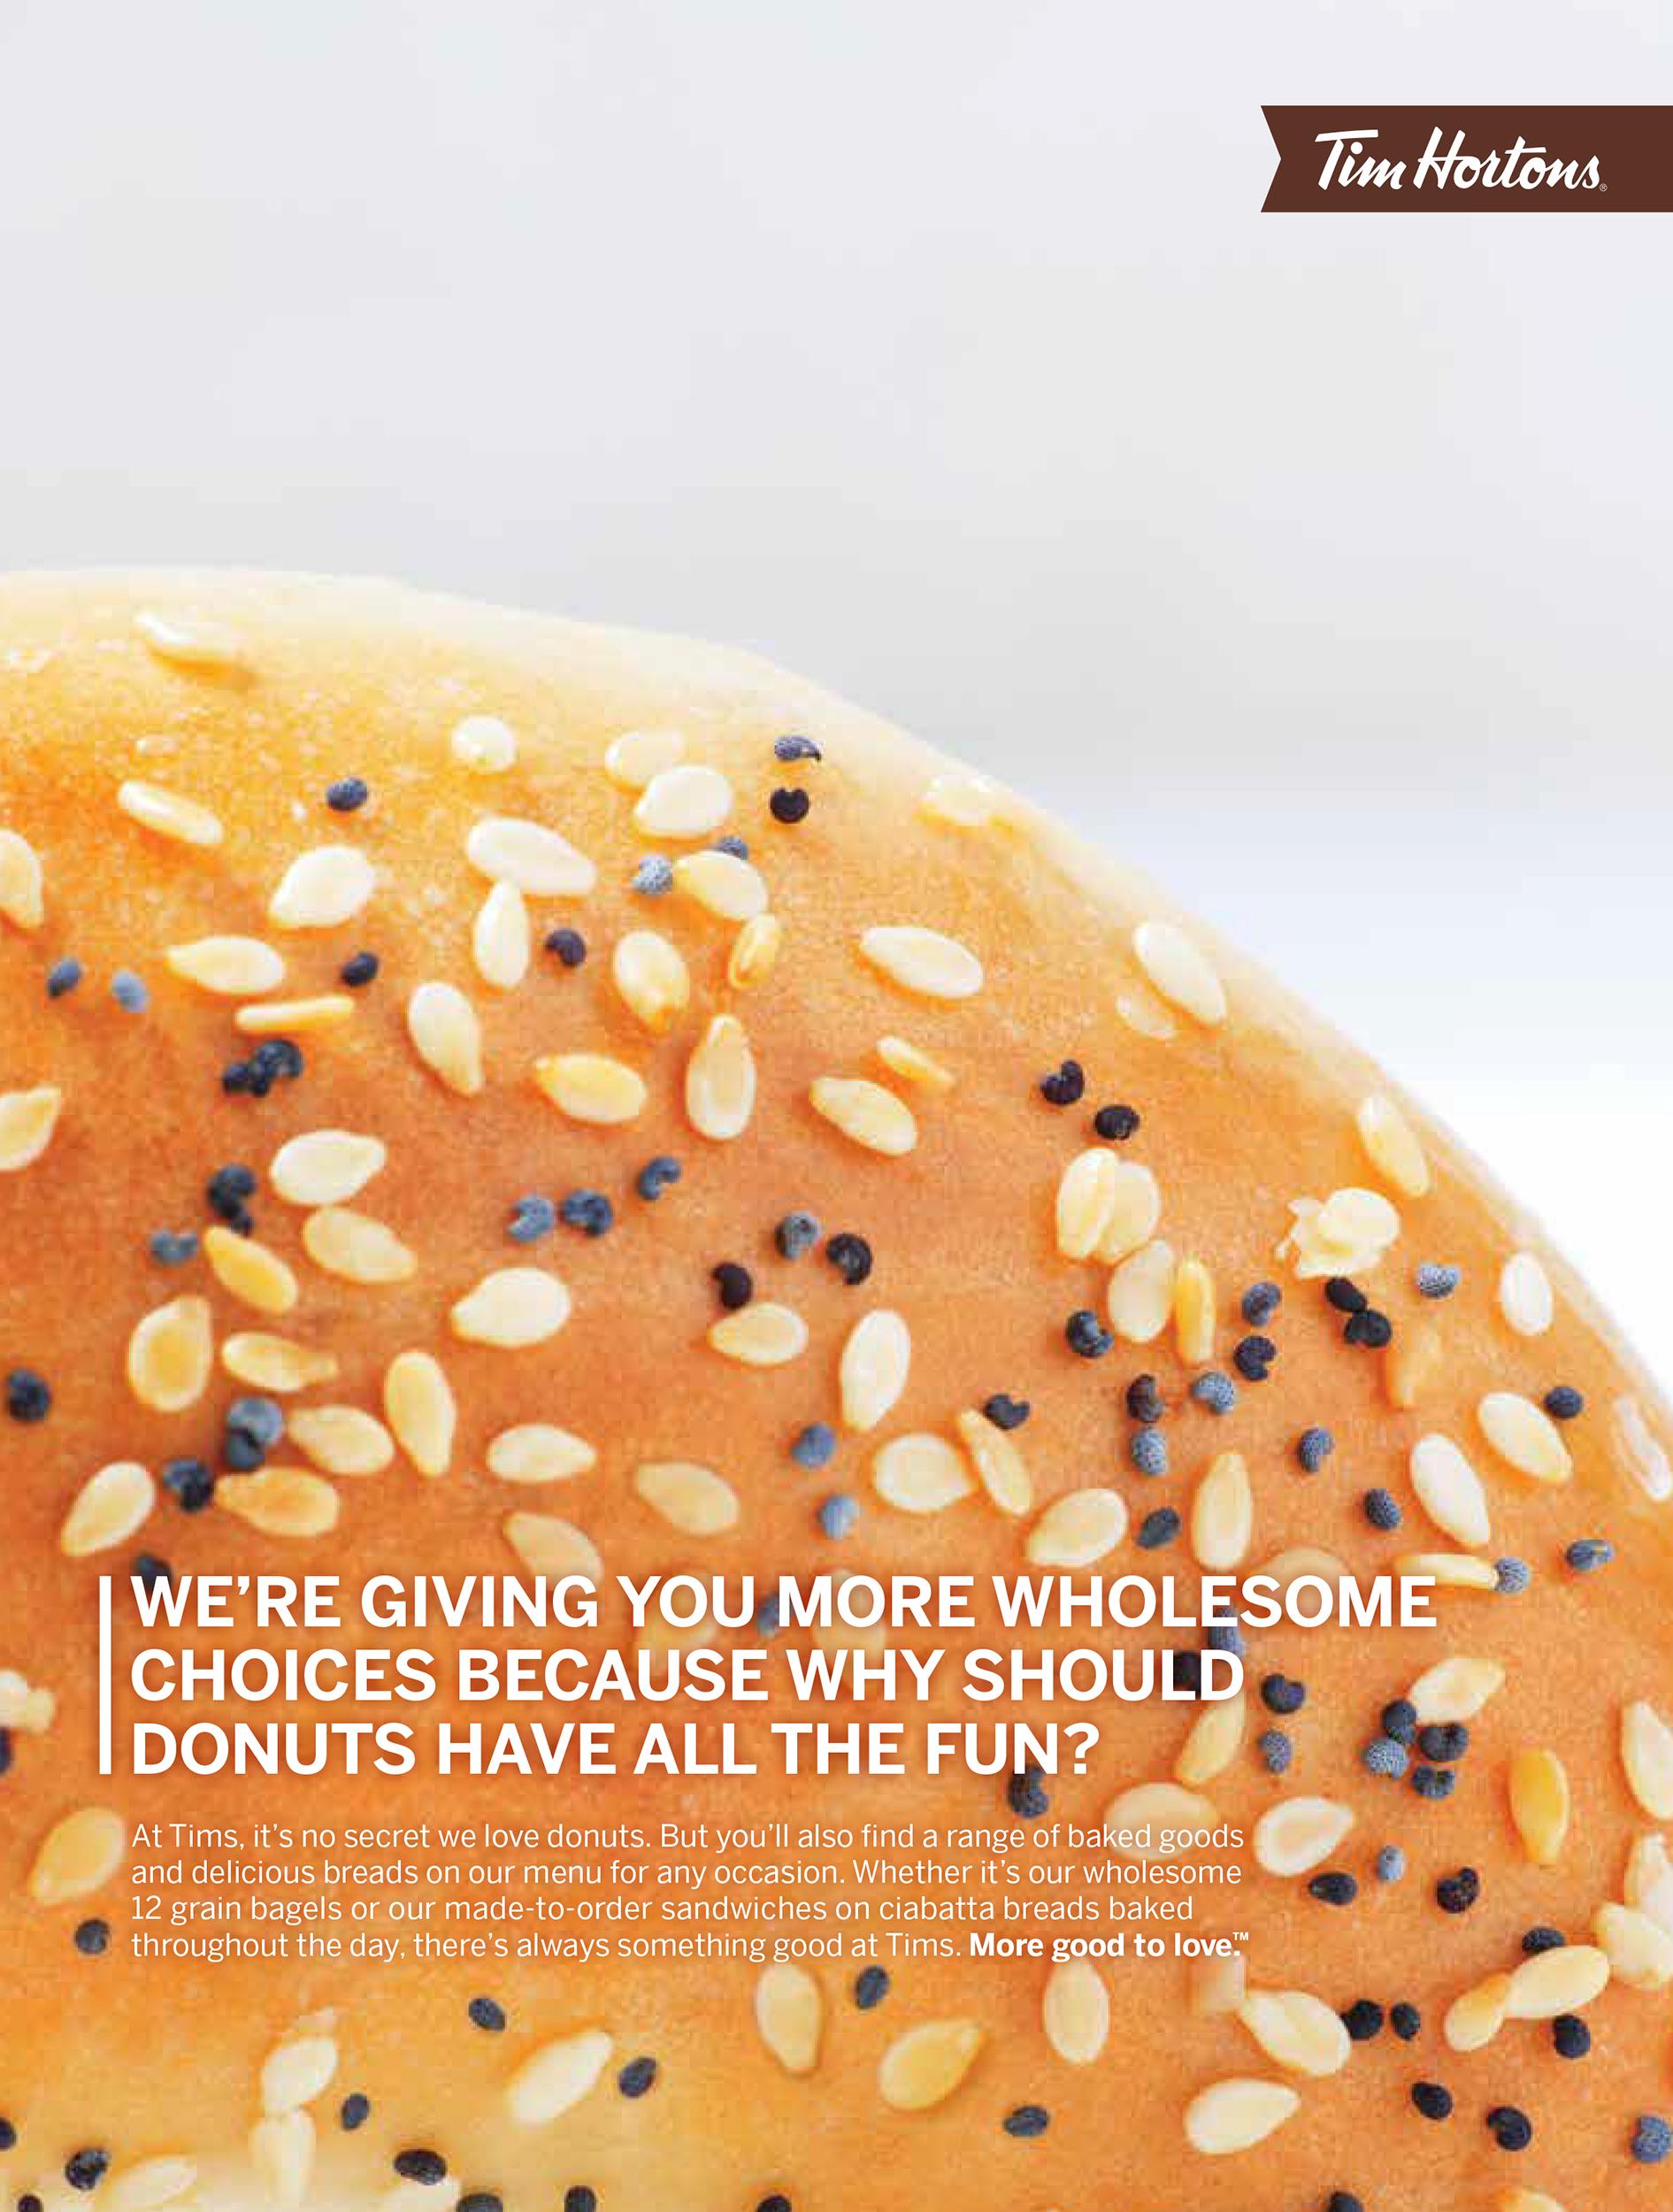 tim hortons advertising bagel baked food fuze reps